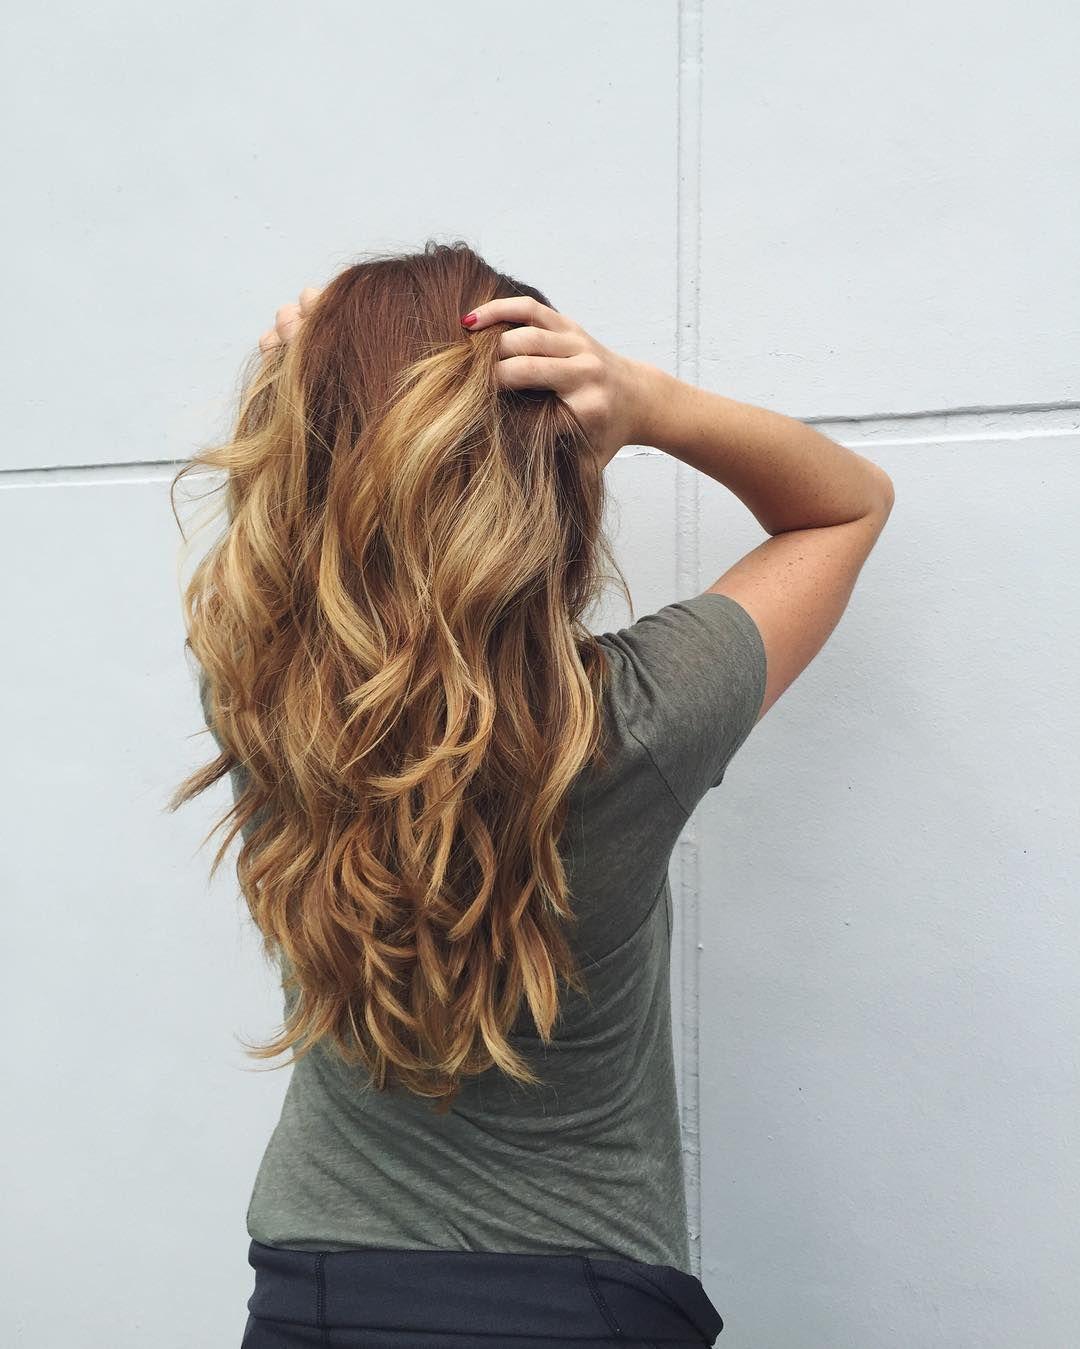 Wavy HoneyBrown/ToffeeBlonde Hair with Layers Long